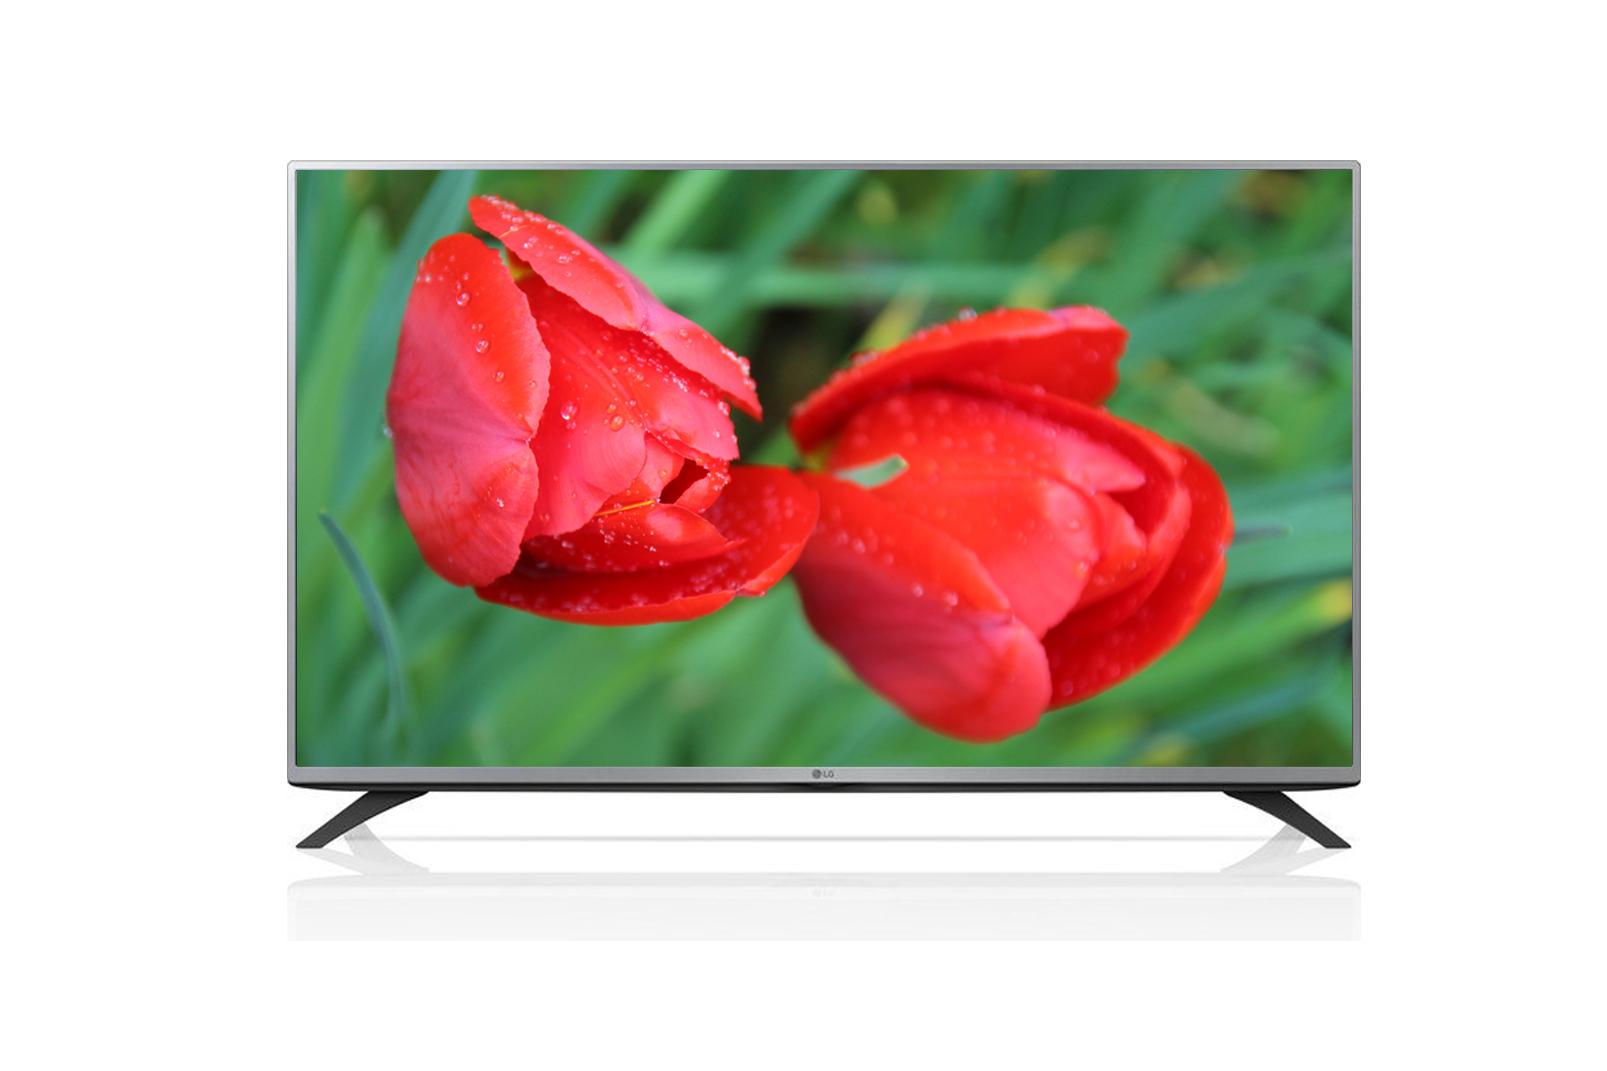 lg 43lf5400 zb farbfernseher lcd led tv 108 cm full hd hdtv usb a tuner ebay. Black Bedroom Furniture Sets. Home Design Ideas